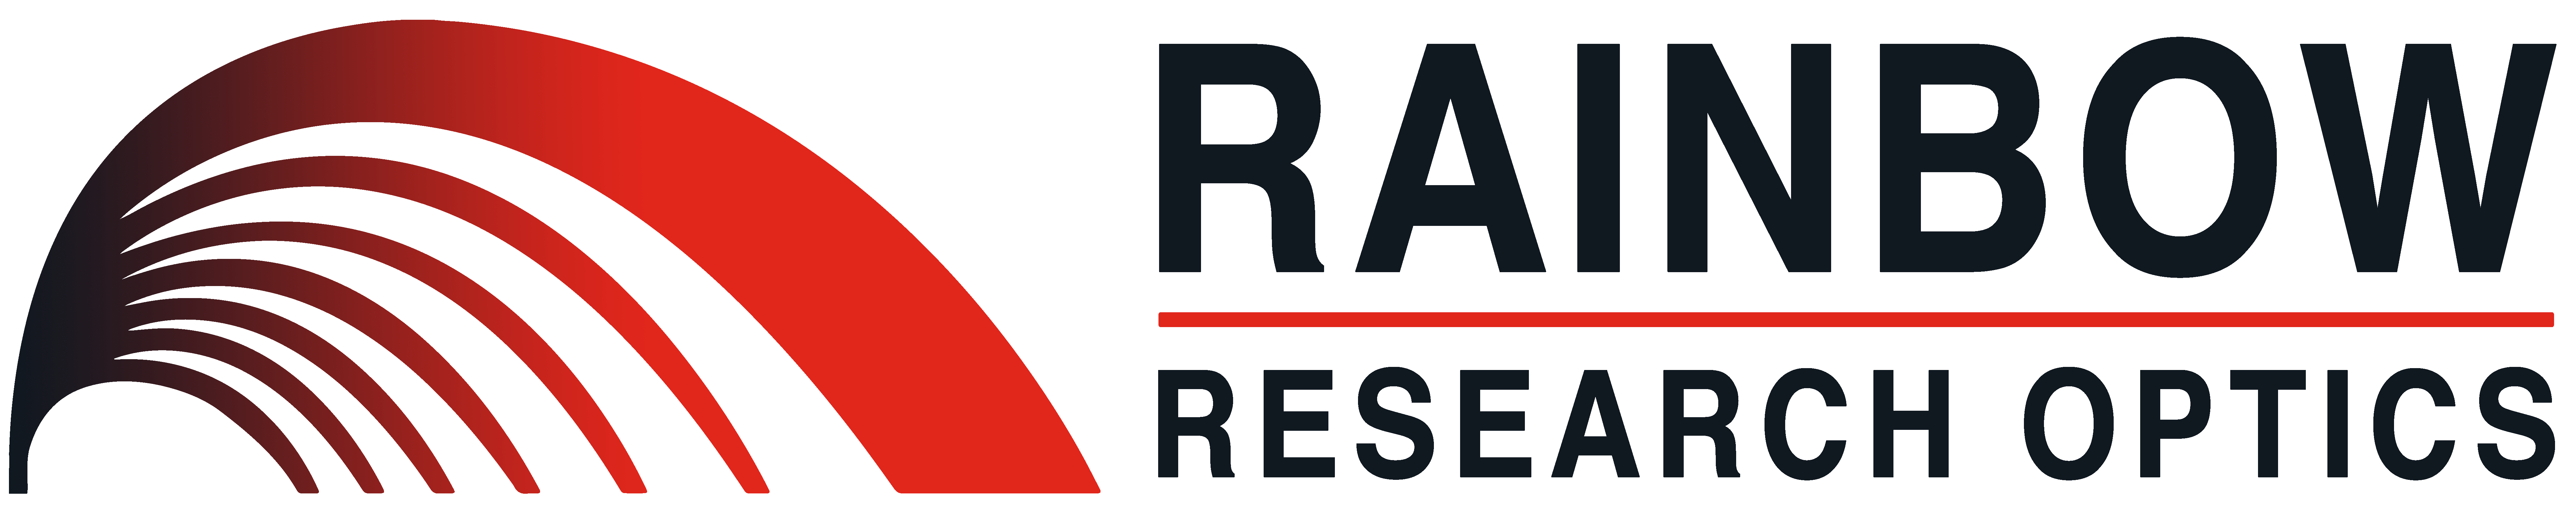 Rainbow Research Optics